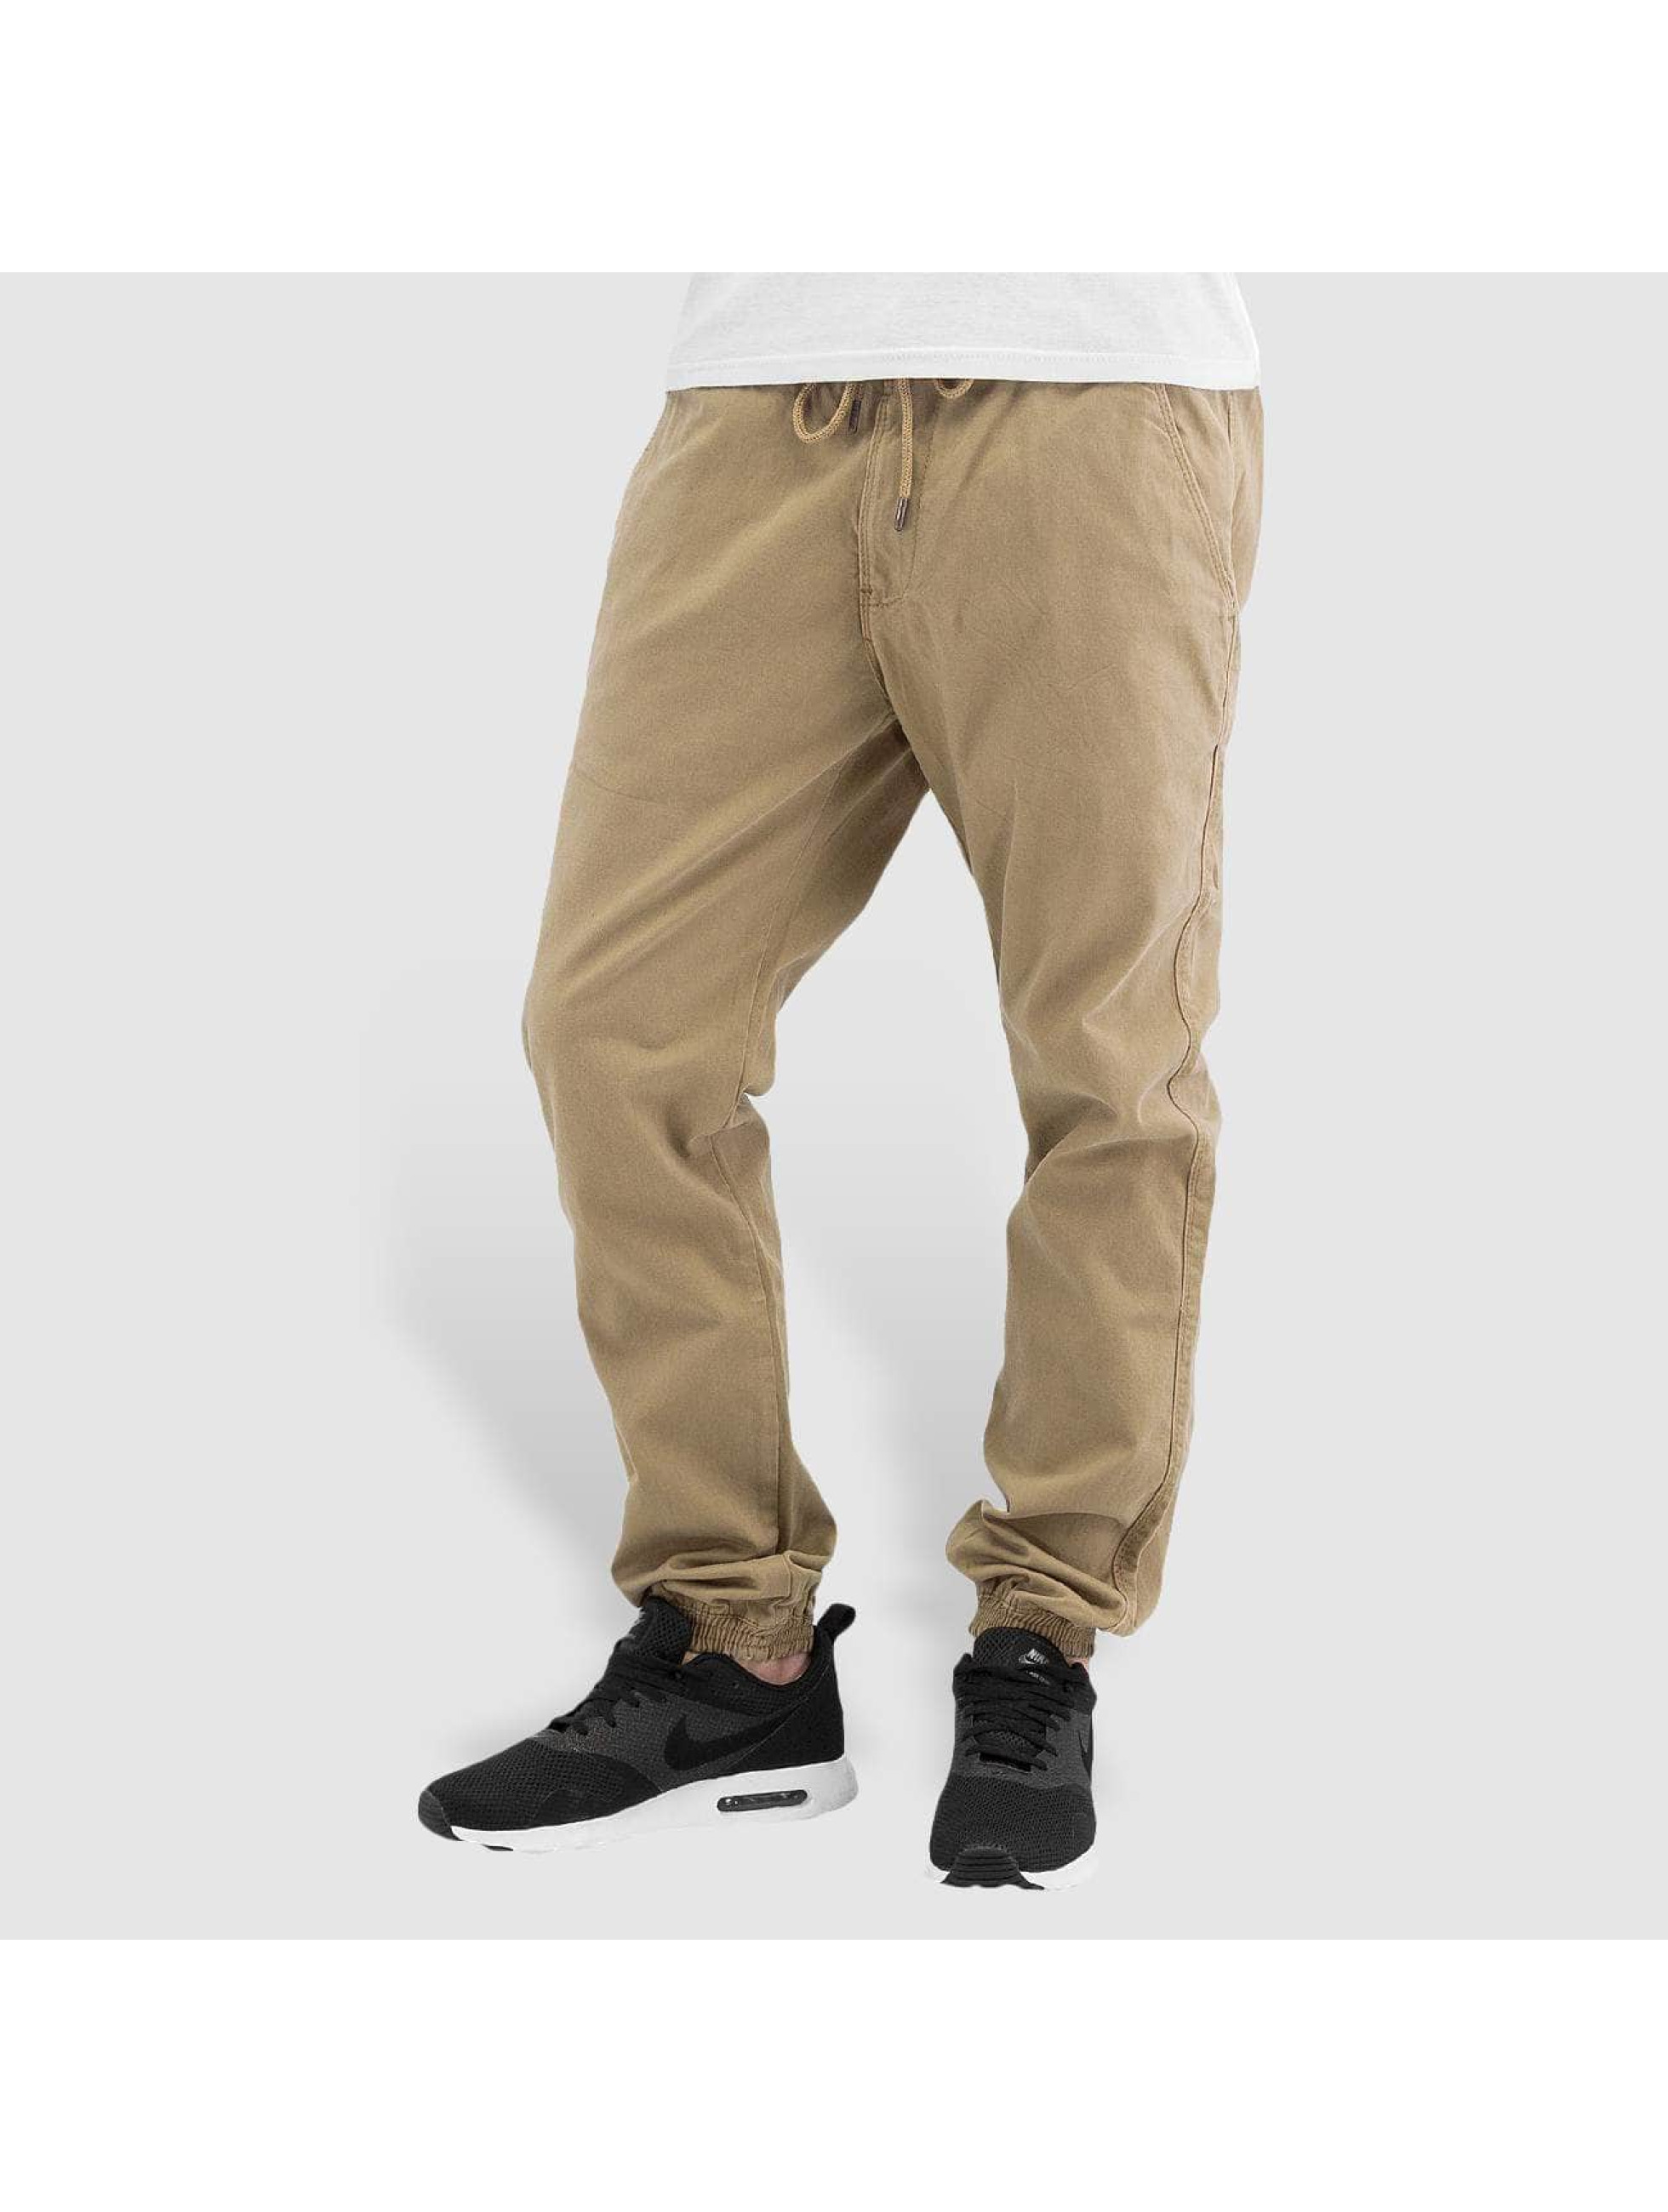 Reell Jeans Chino Reflex Twill beige